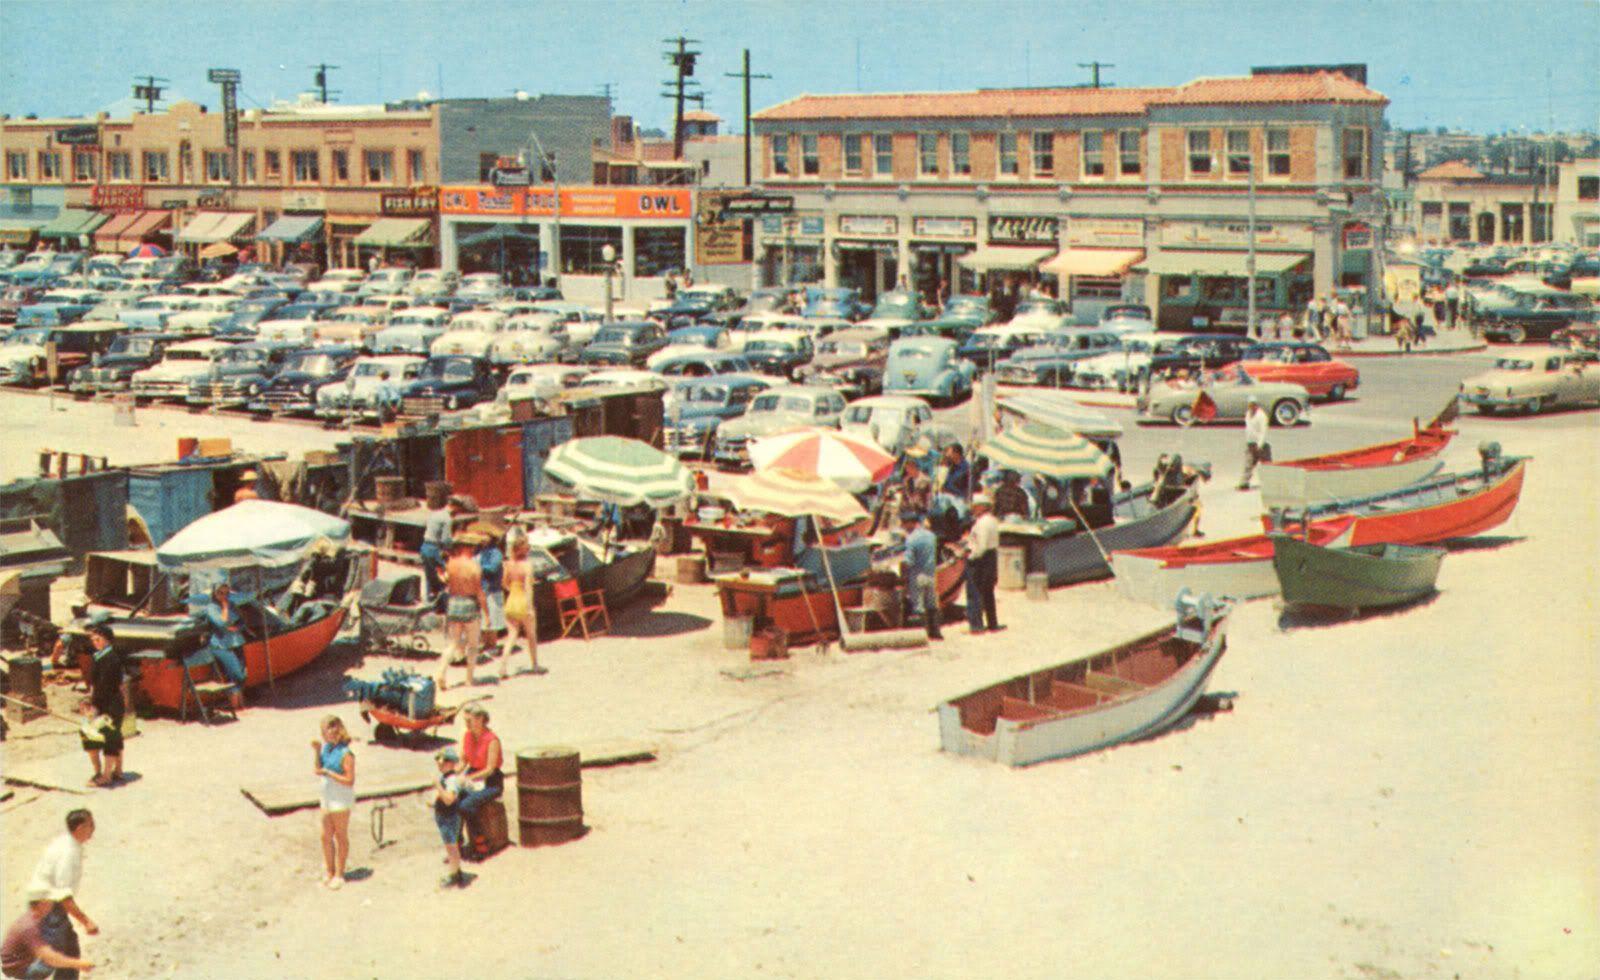 Fish Market At Newport Beach Circa 1952 With Images Newport Beach California Newport Beach Capistrano Beach